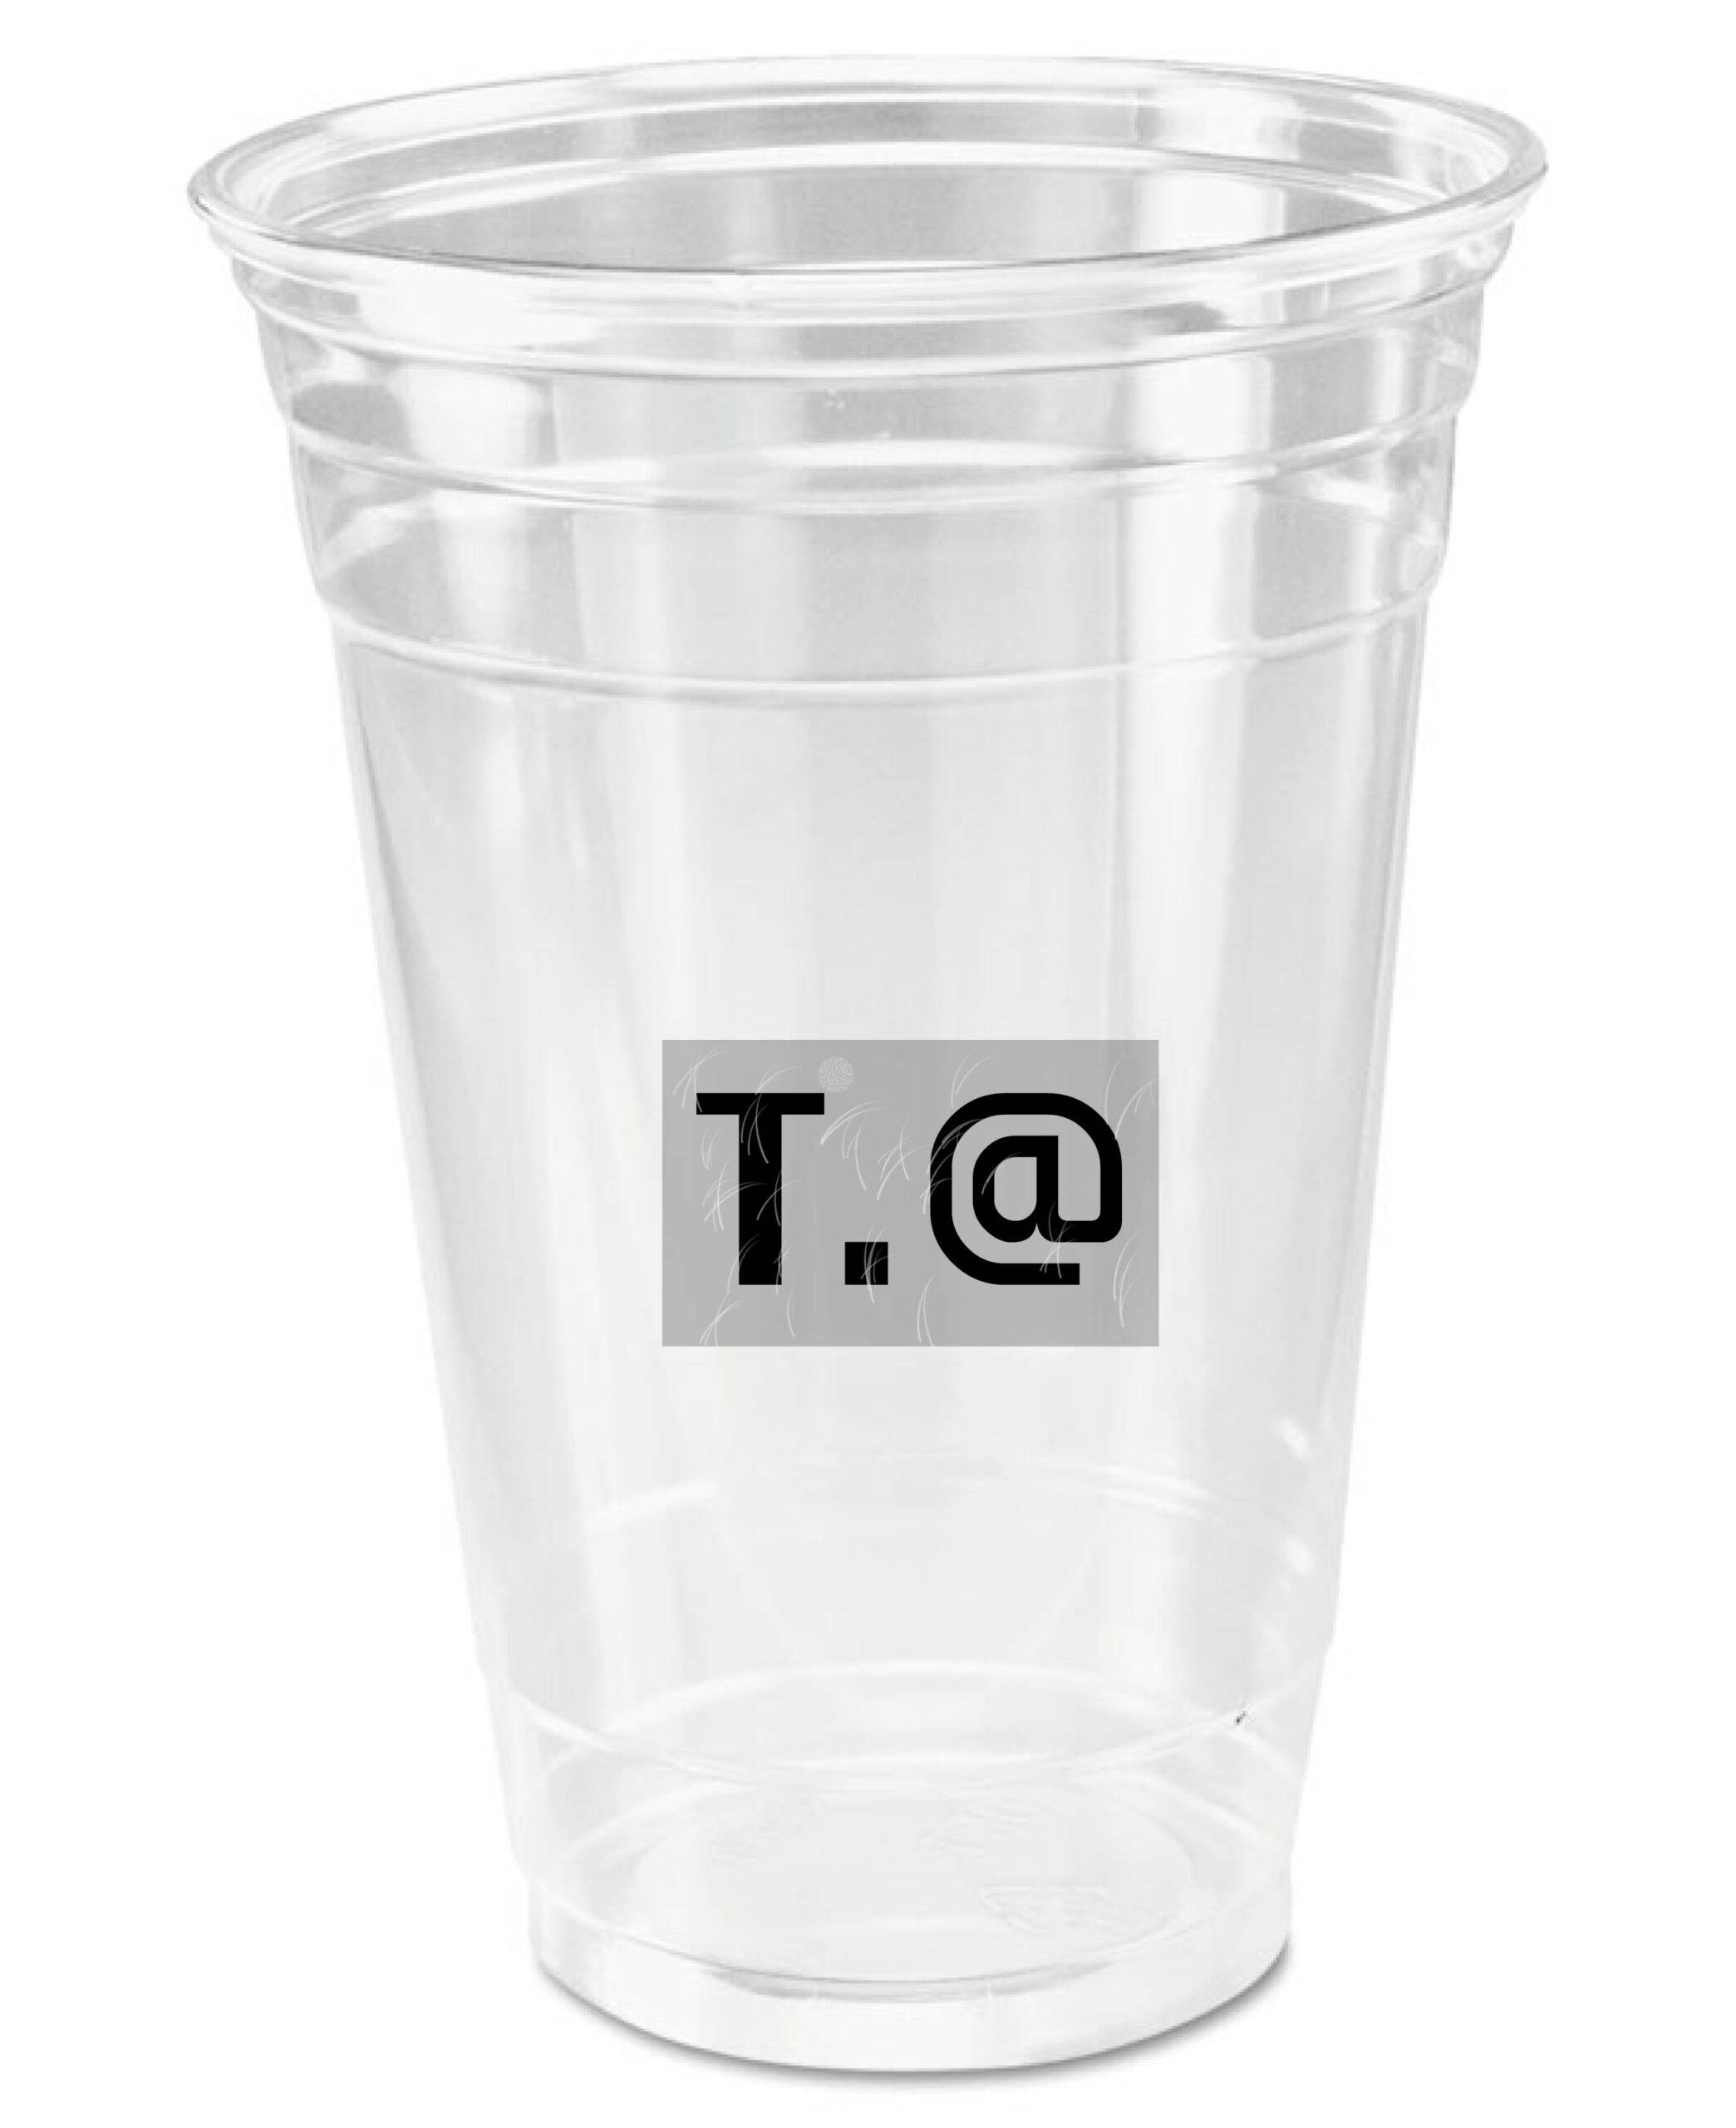 20 oz plastic PET cups